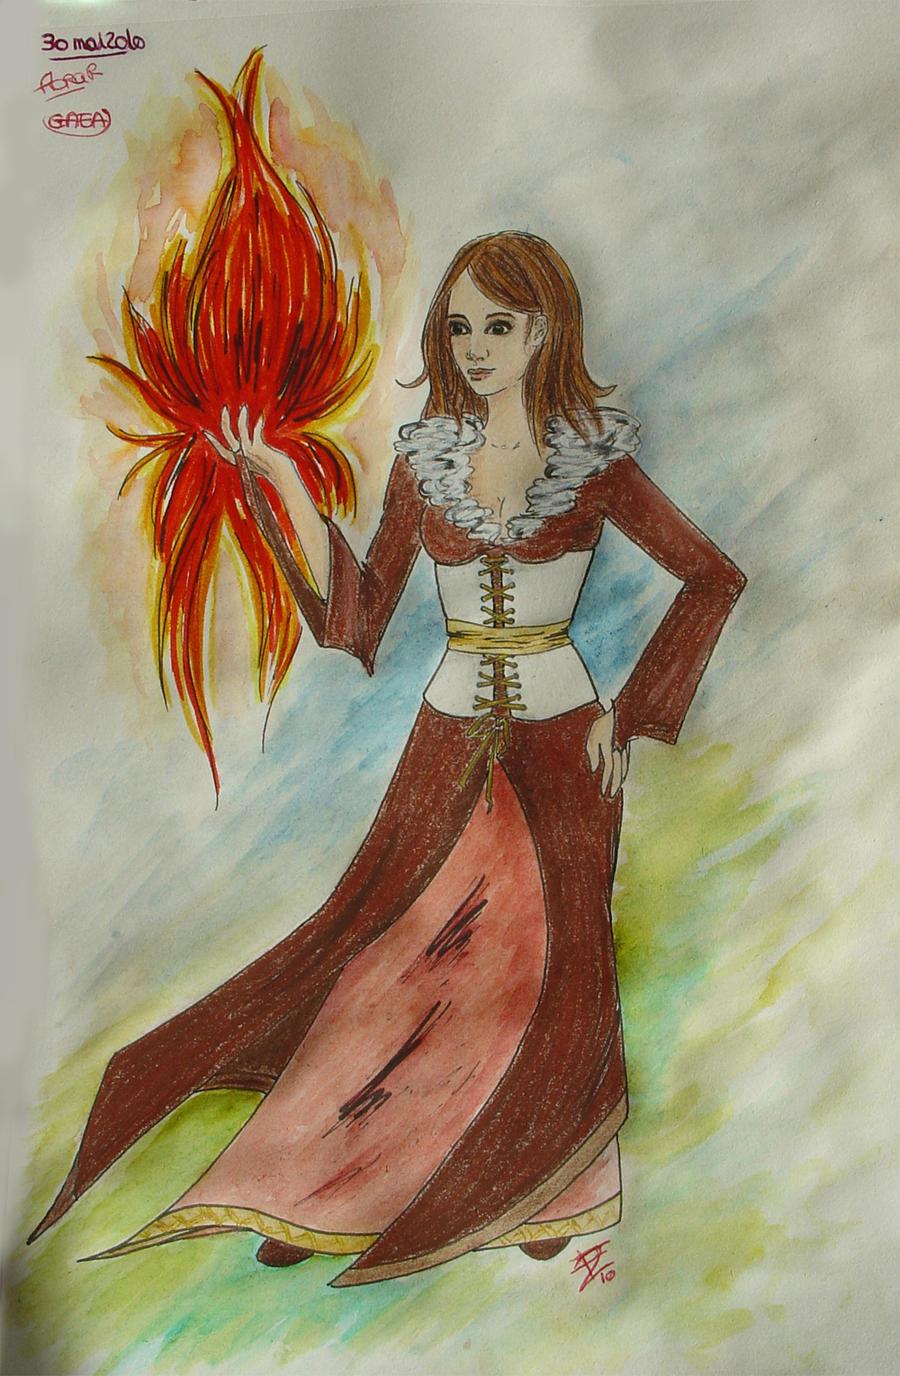 Gaea by Lady-Kiwi